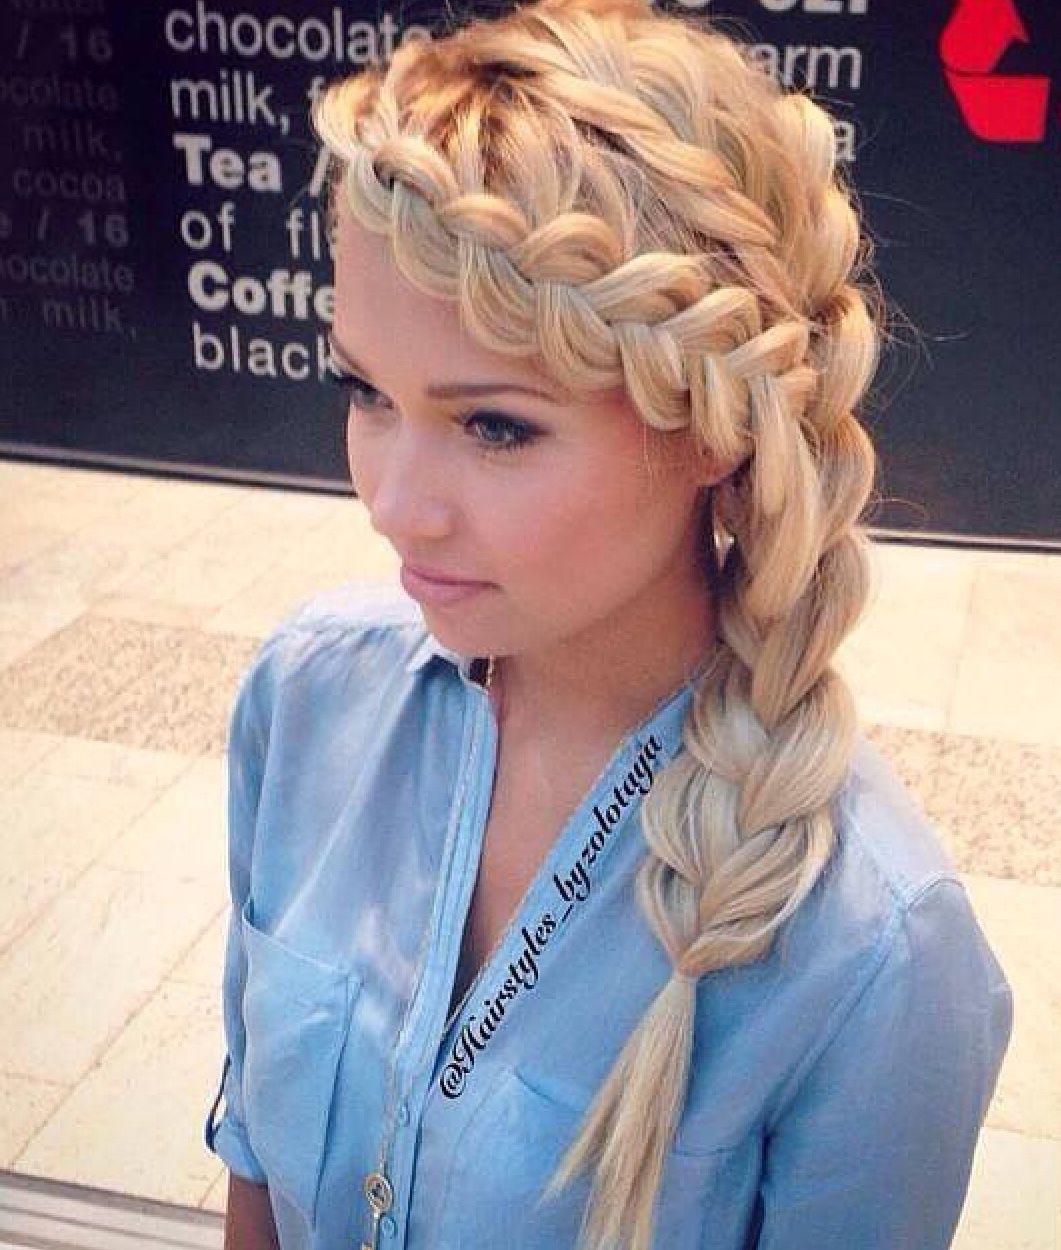 Elegant Updo Wedding Hairstyles Spring 2015: Pinterest @ AceOfSpadessss ♠️